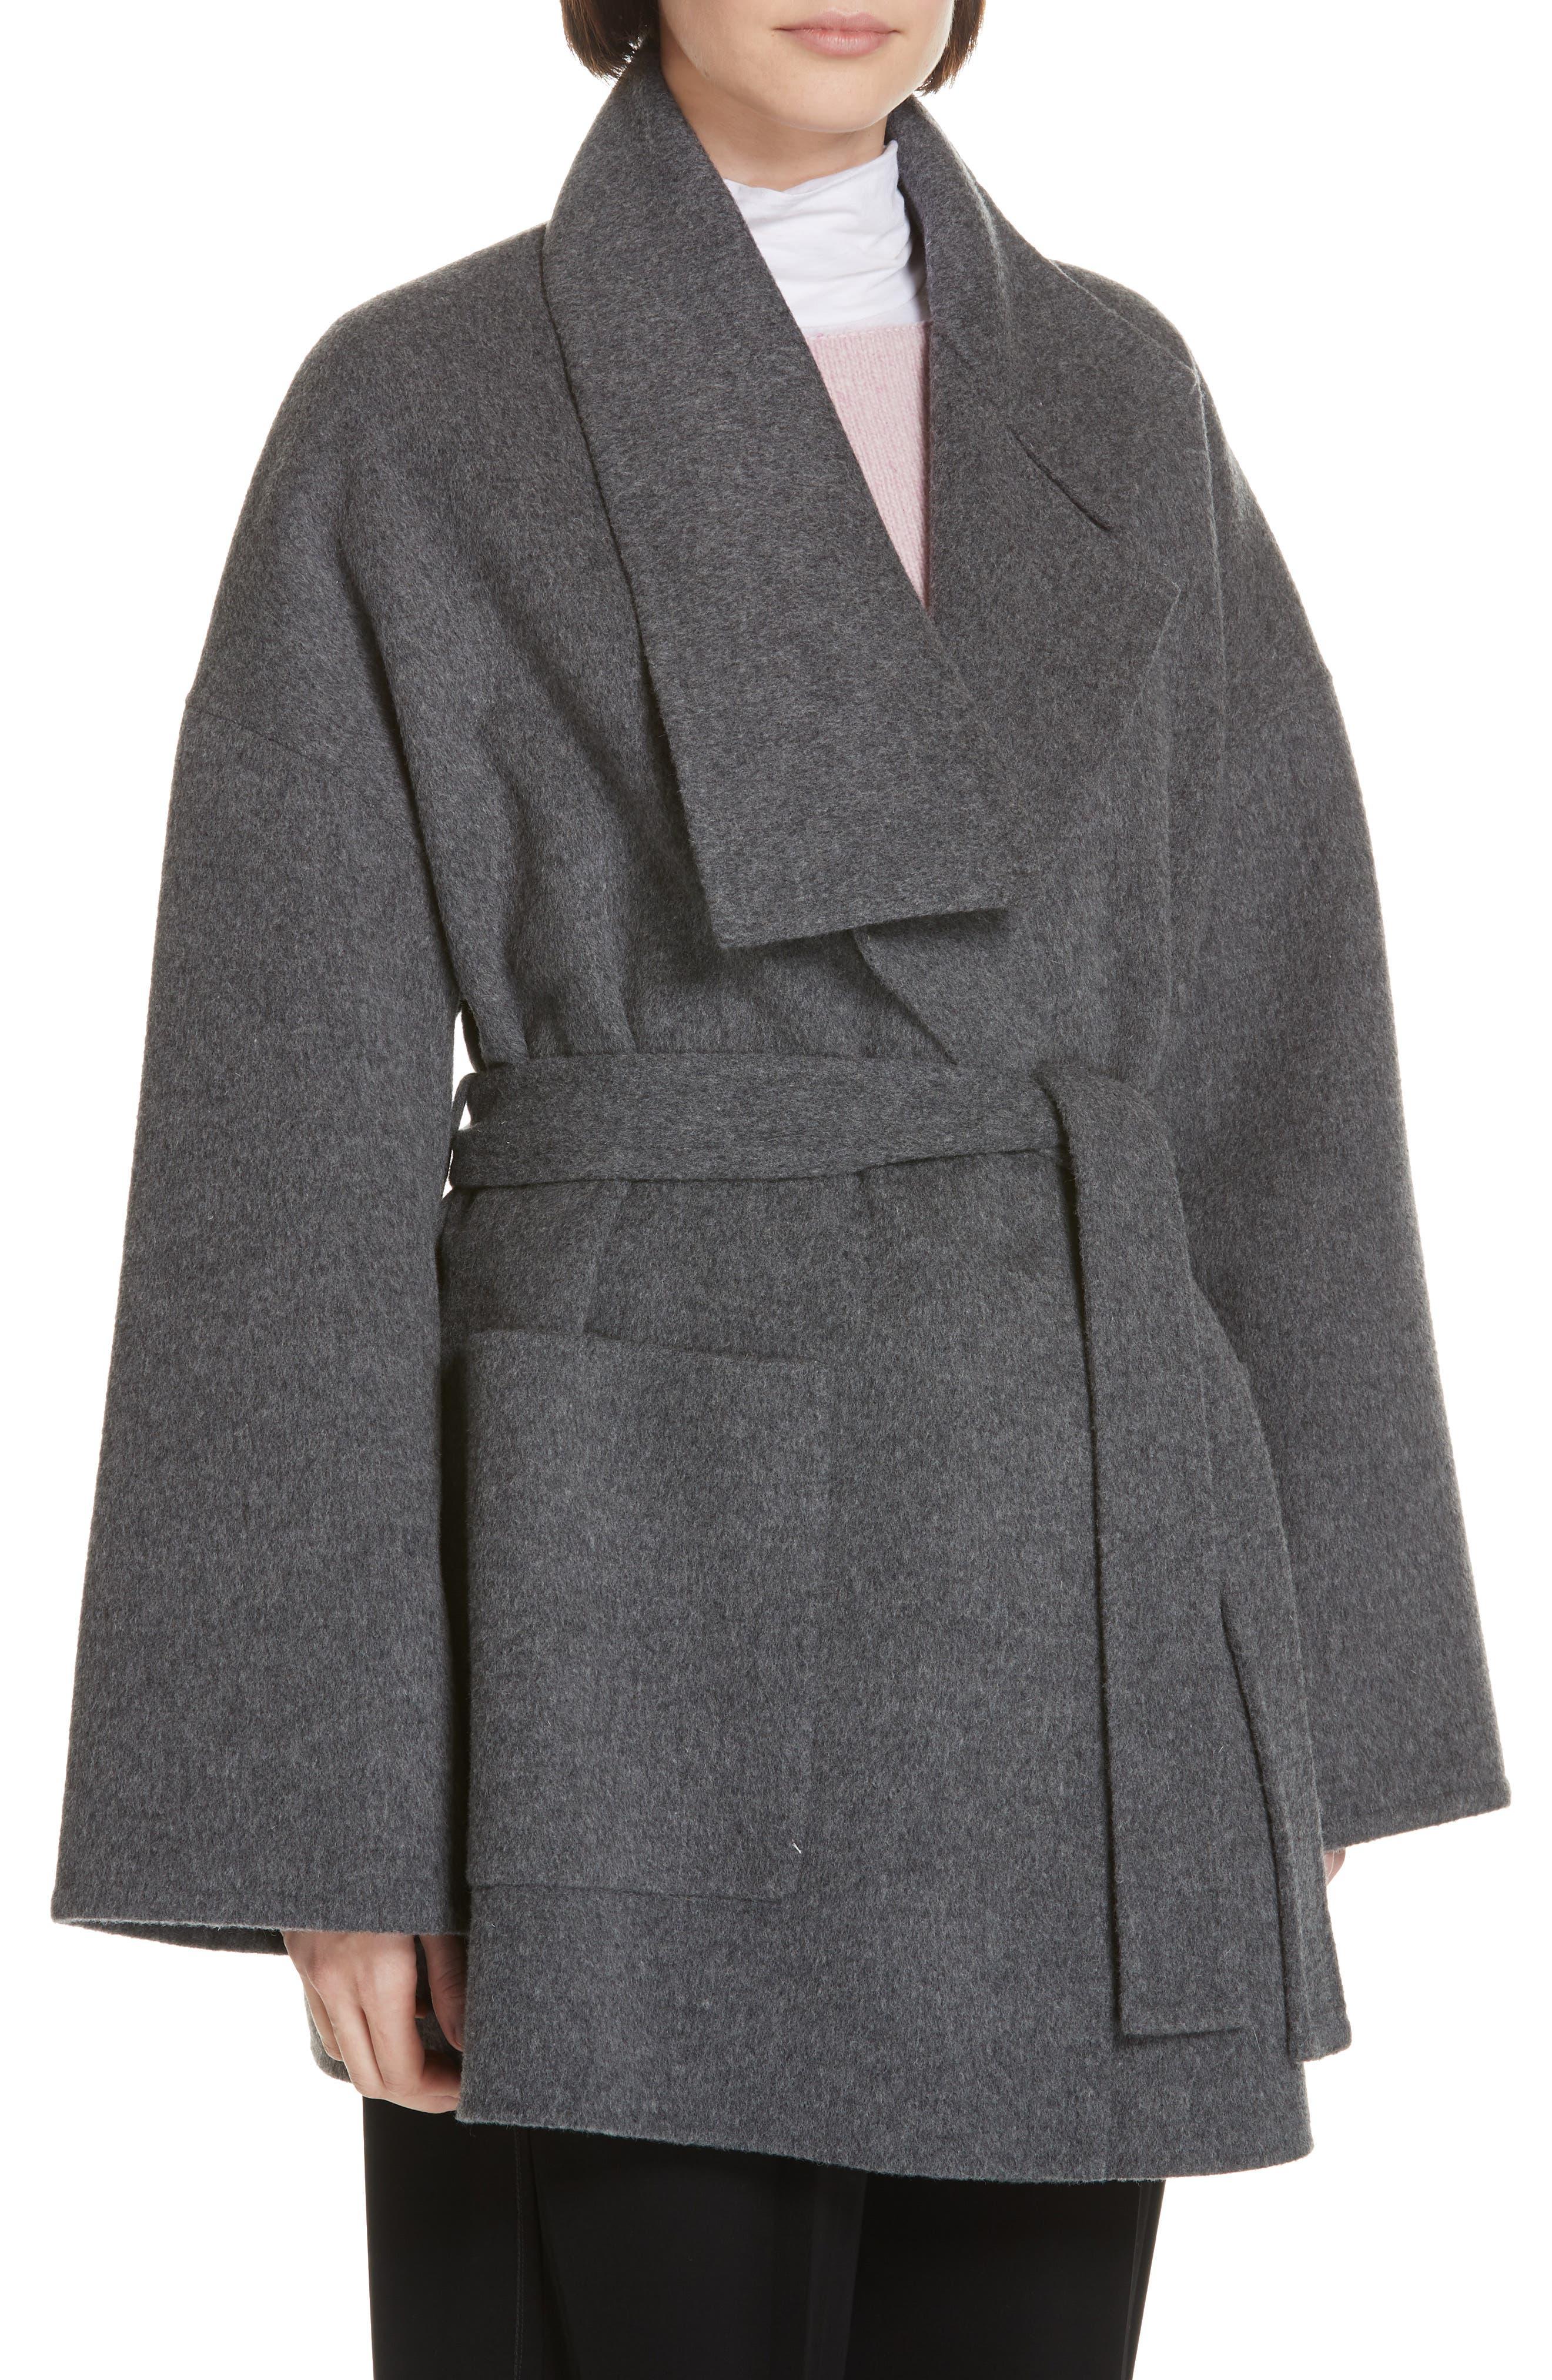 Blanket Coat,                             Alternate thumbnail 4, color,                             H GREY